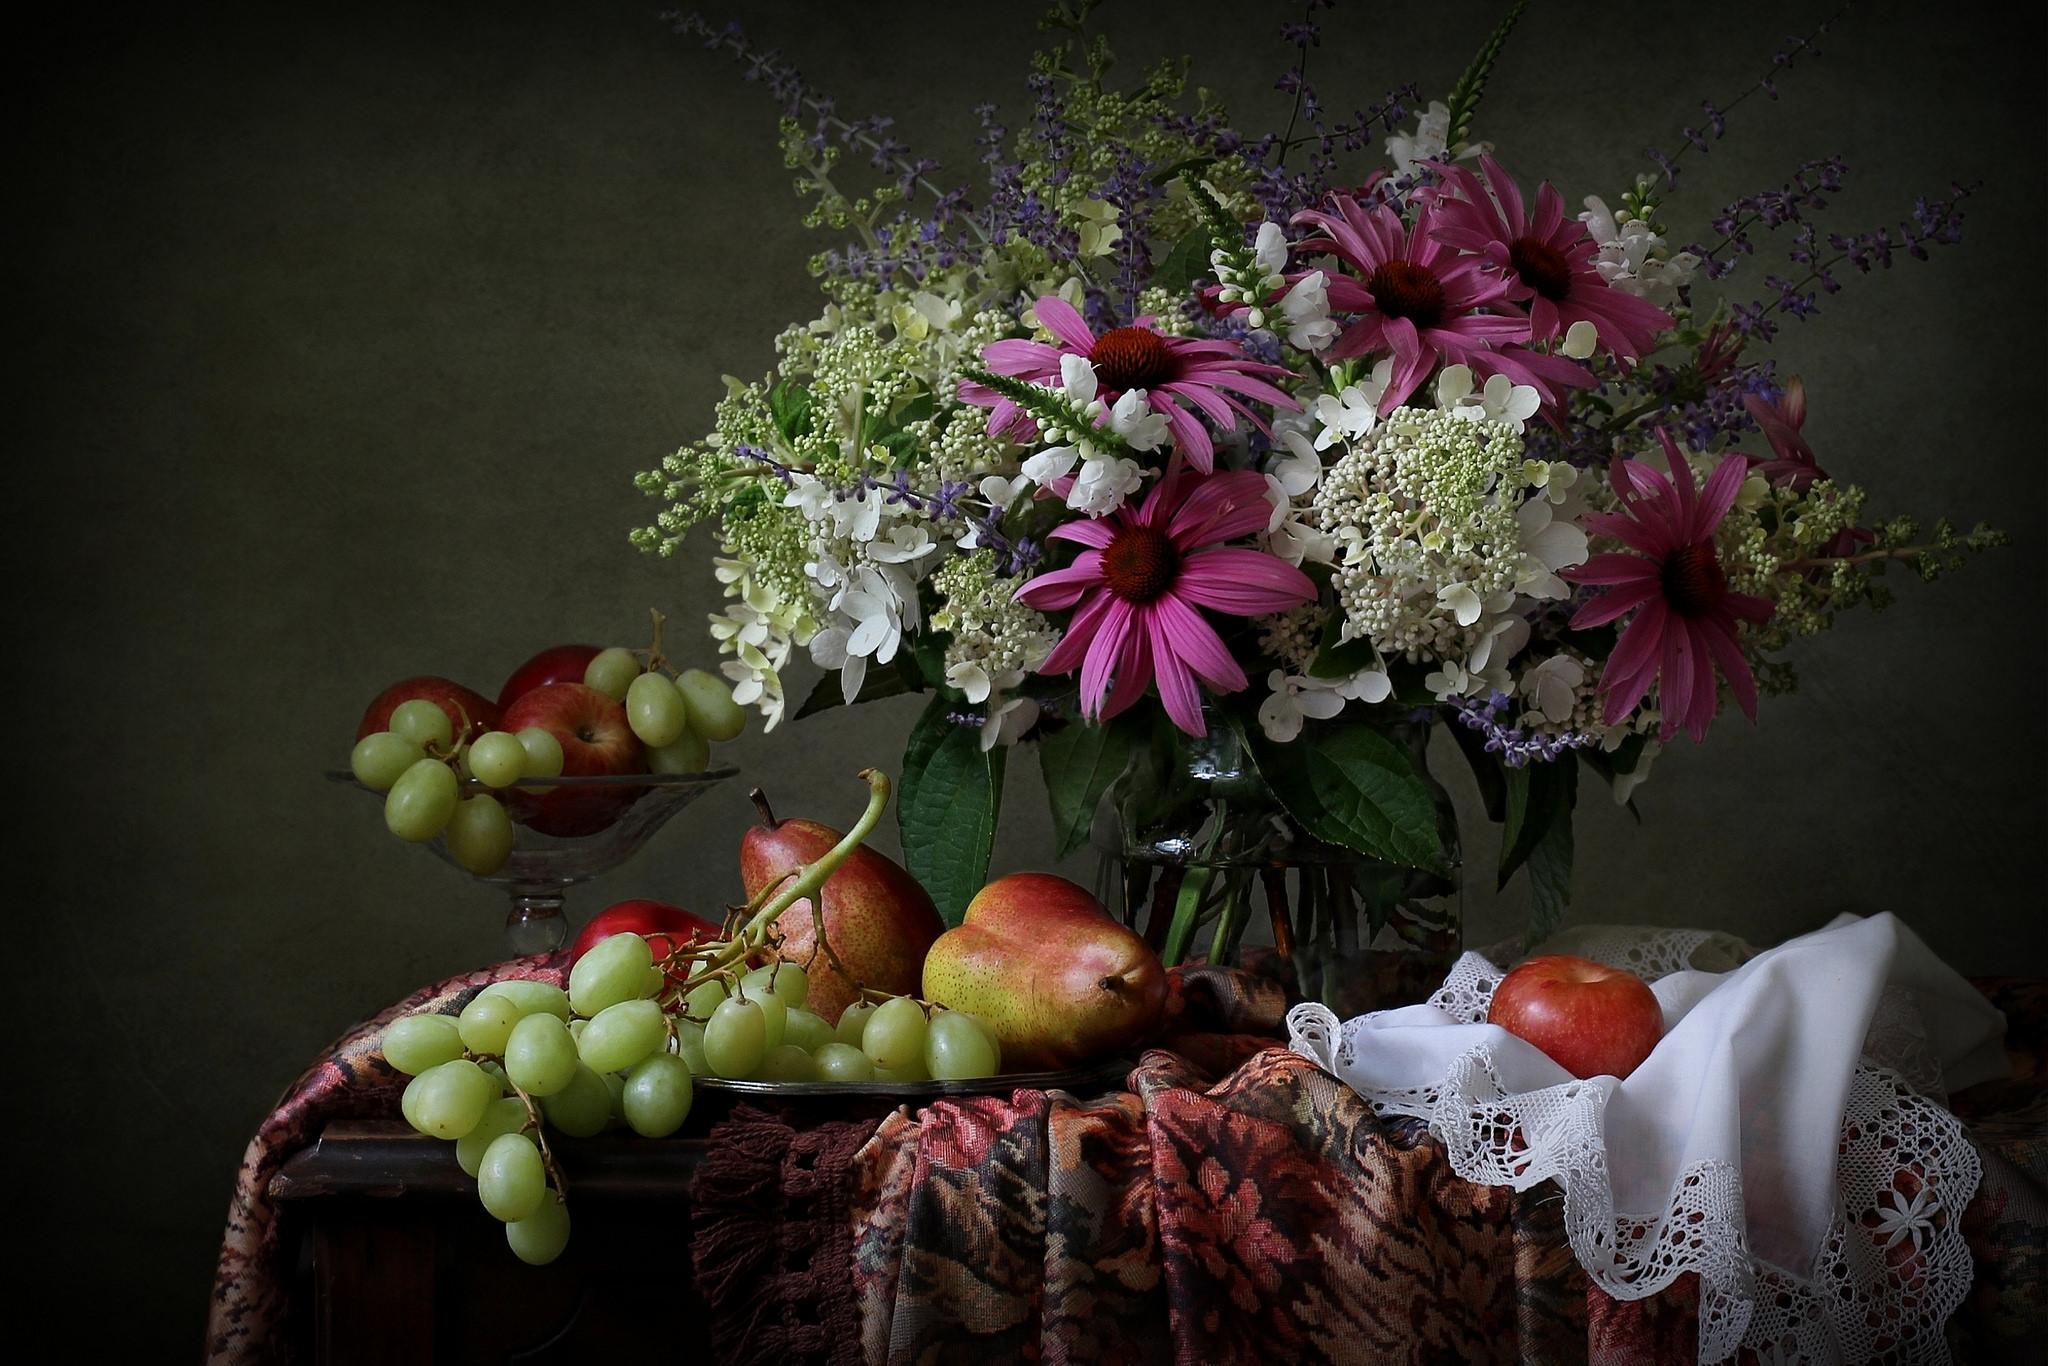 натюрморт фото фрукты цветы было